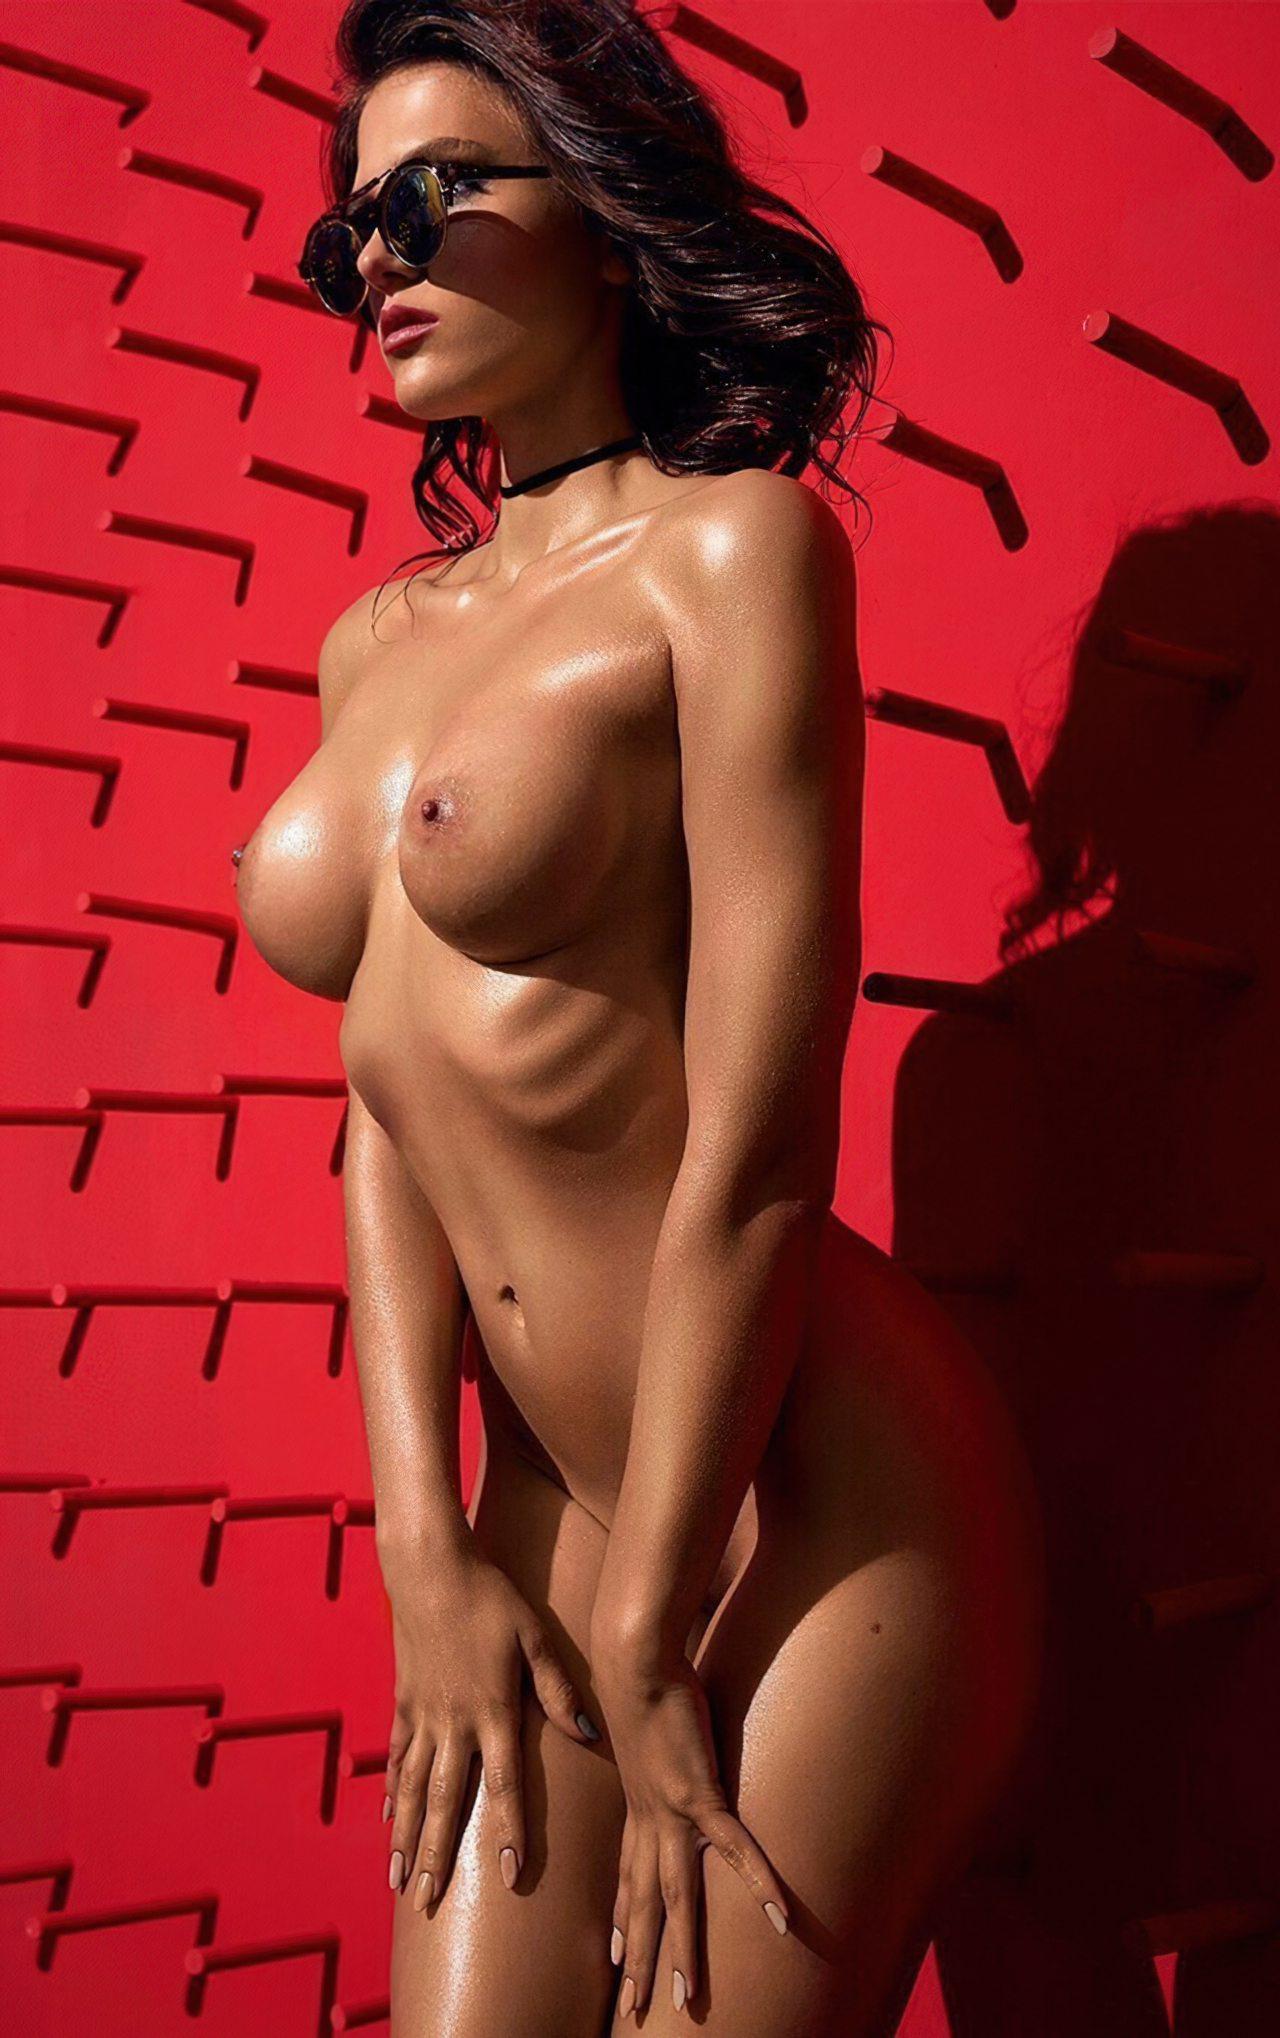 Mulheres Despidas (41)